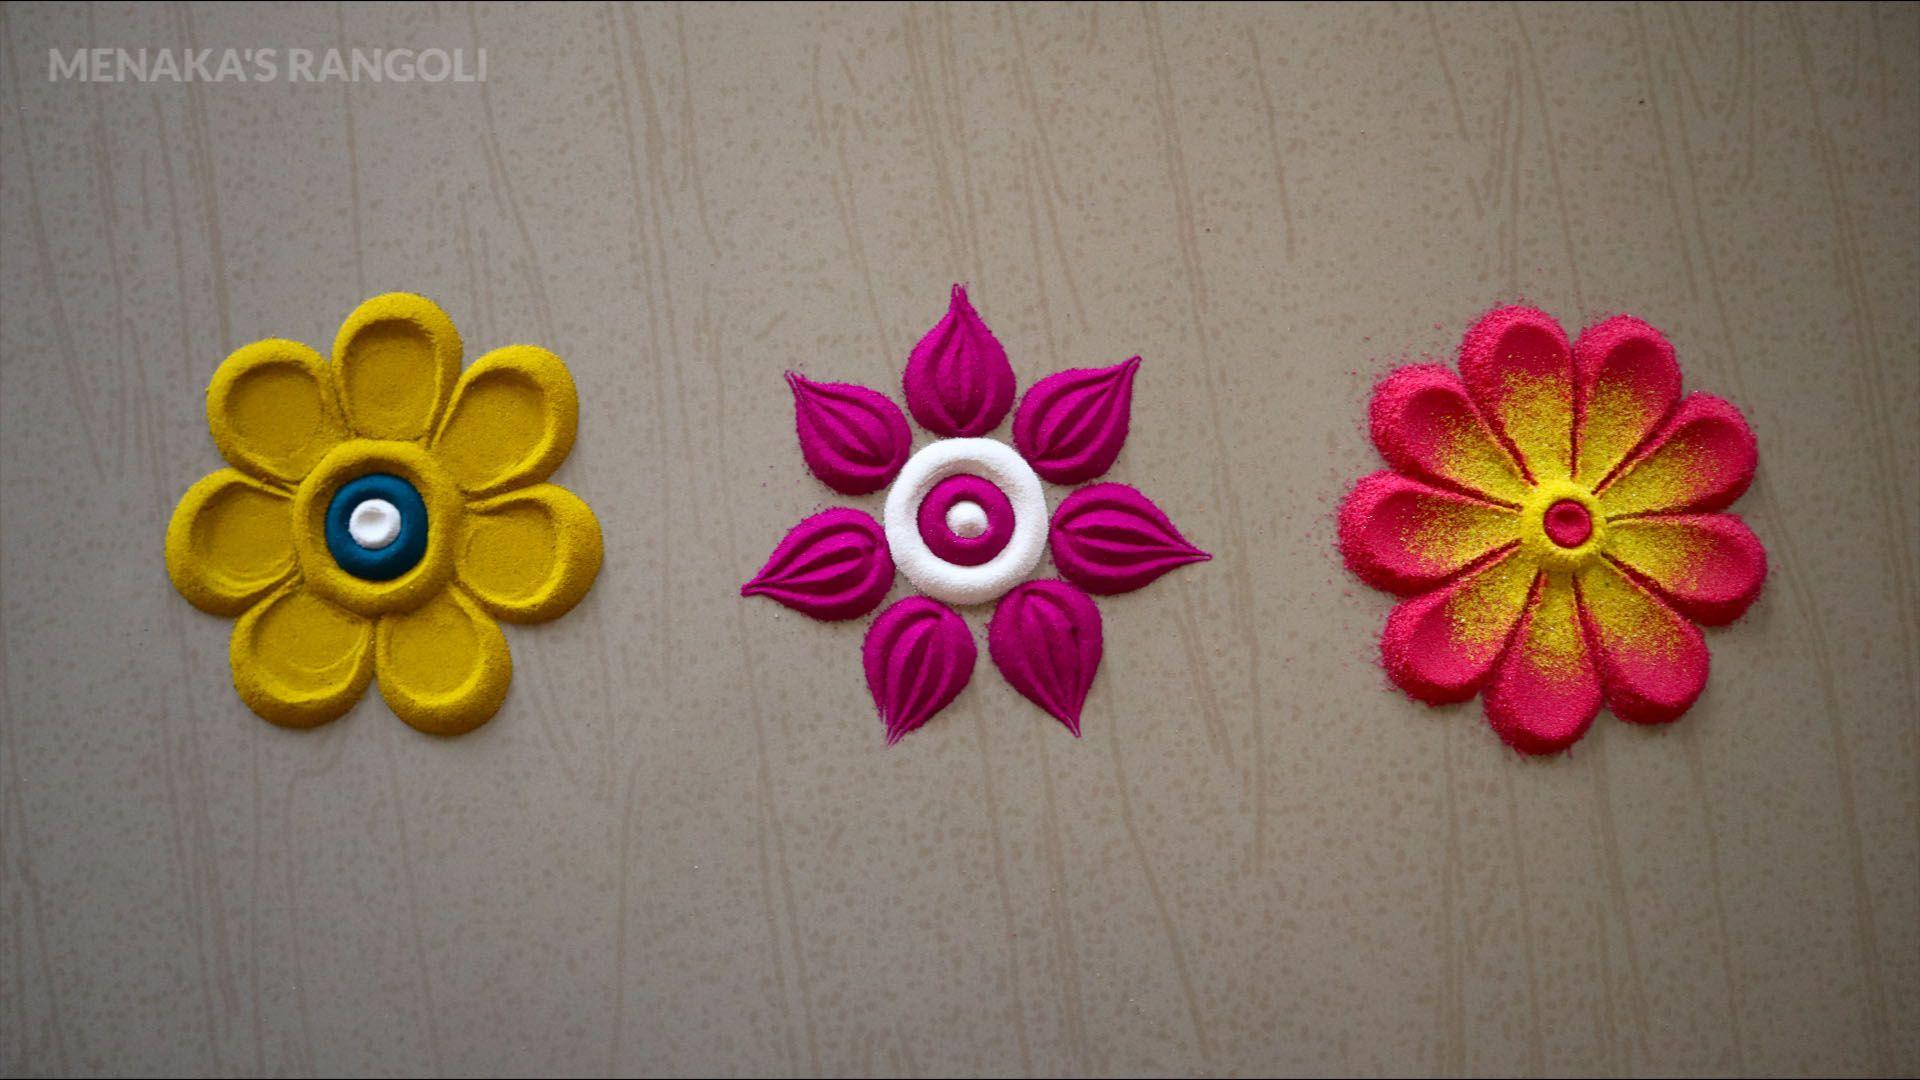 Pin by Bhavya Asokan on Rangoli Flower rangoli, Easy